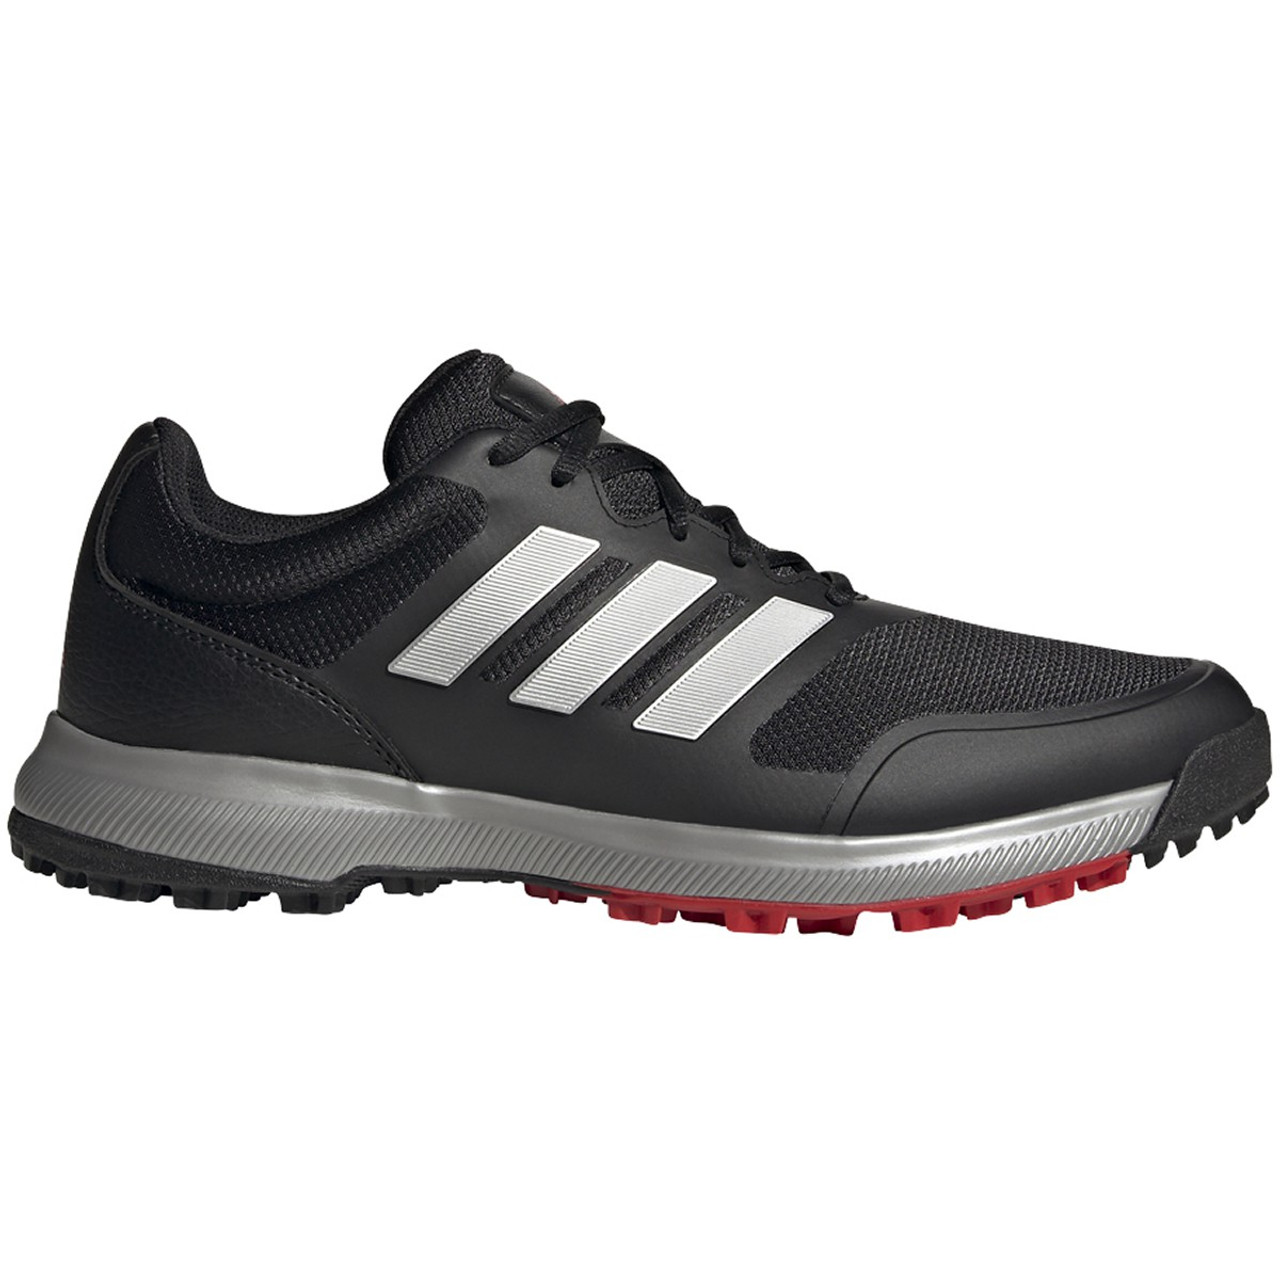 Adidas Tech Response Spikeless Golf Shoes - Black / Silver / Scarlet